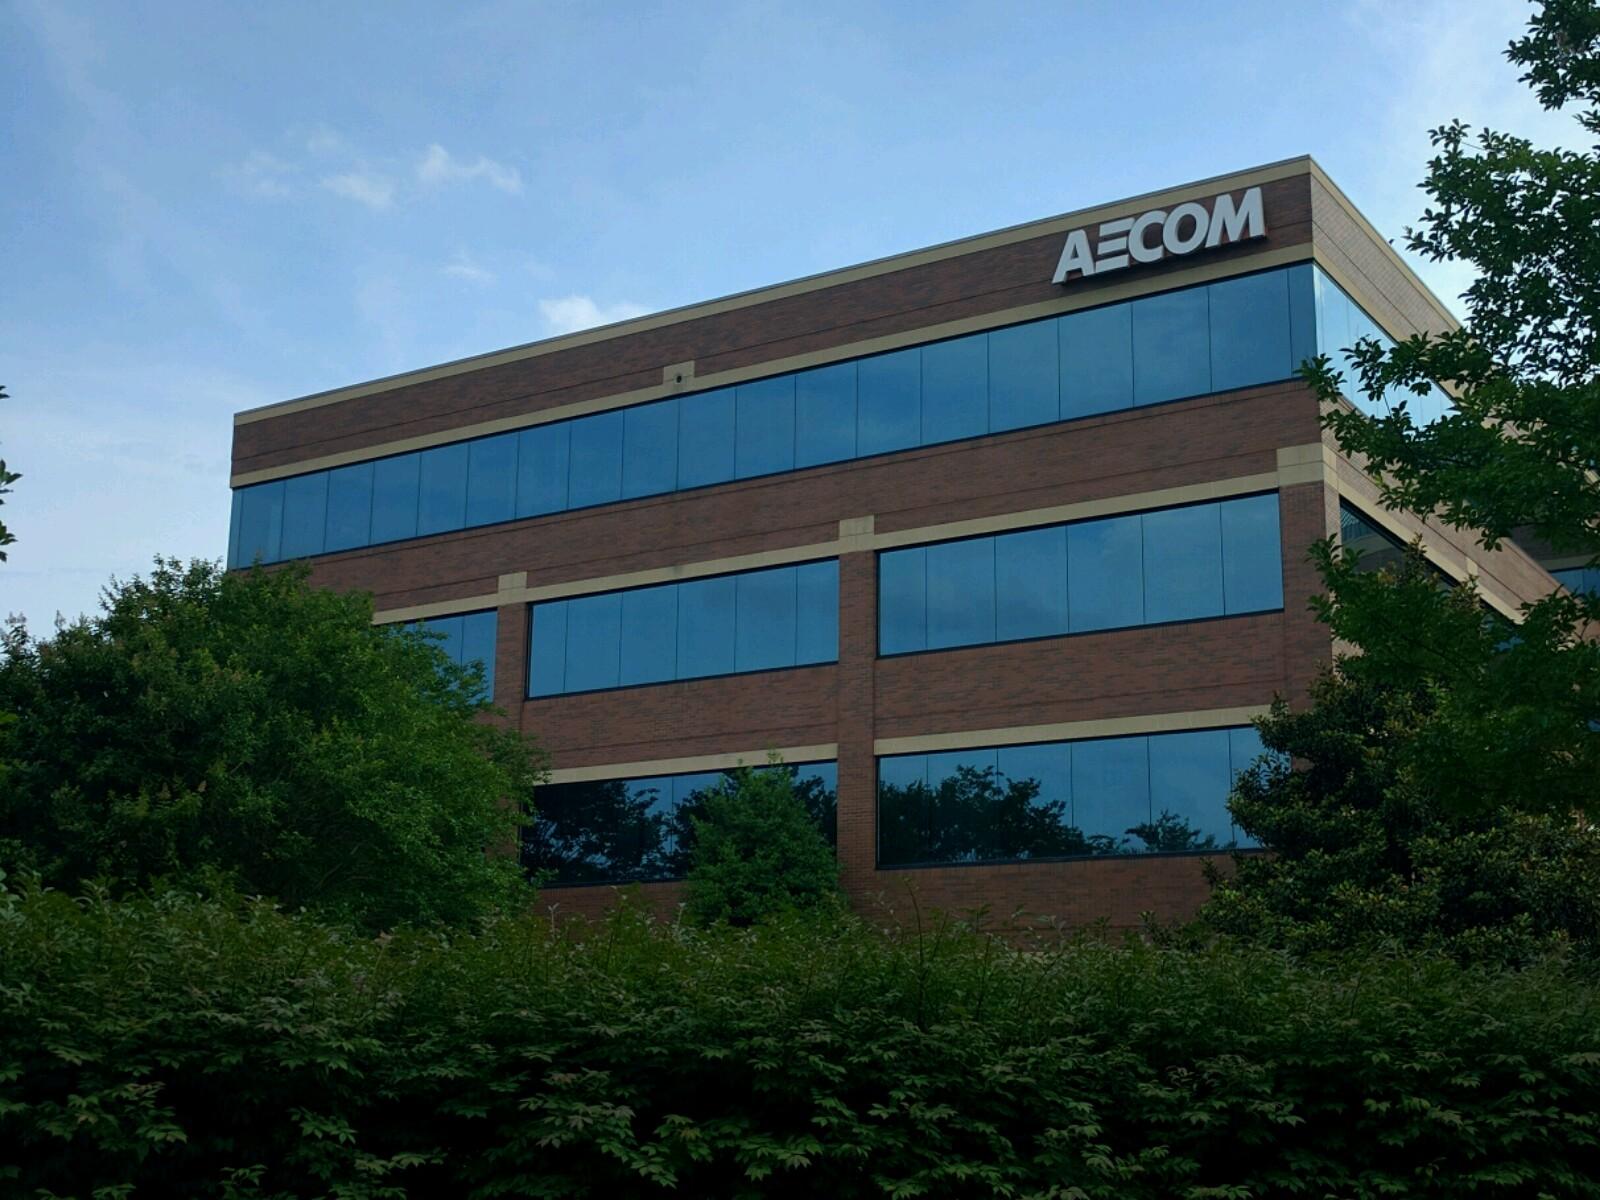 AECOM office in Raleigh, North Carolina.